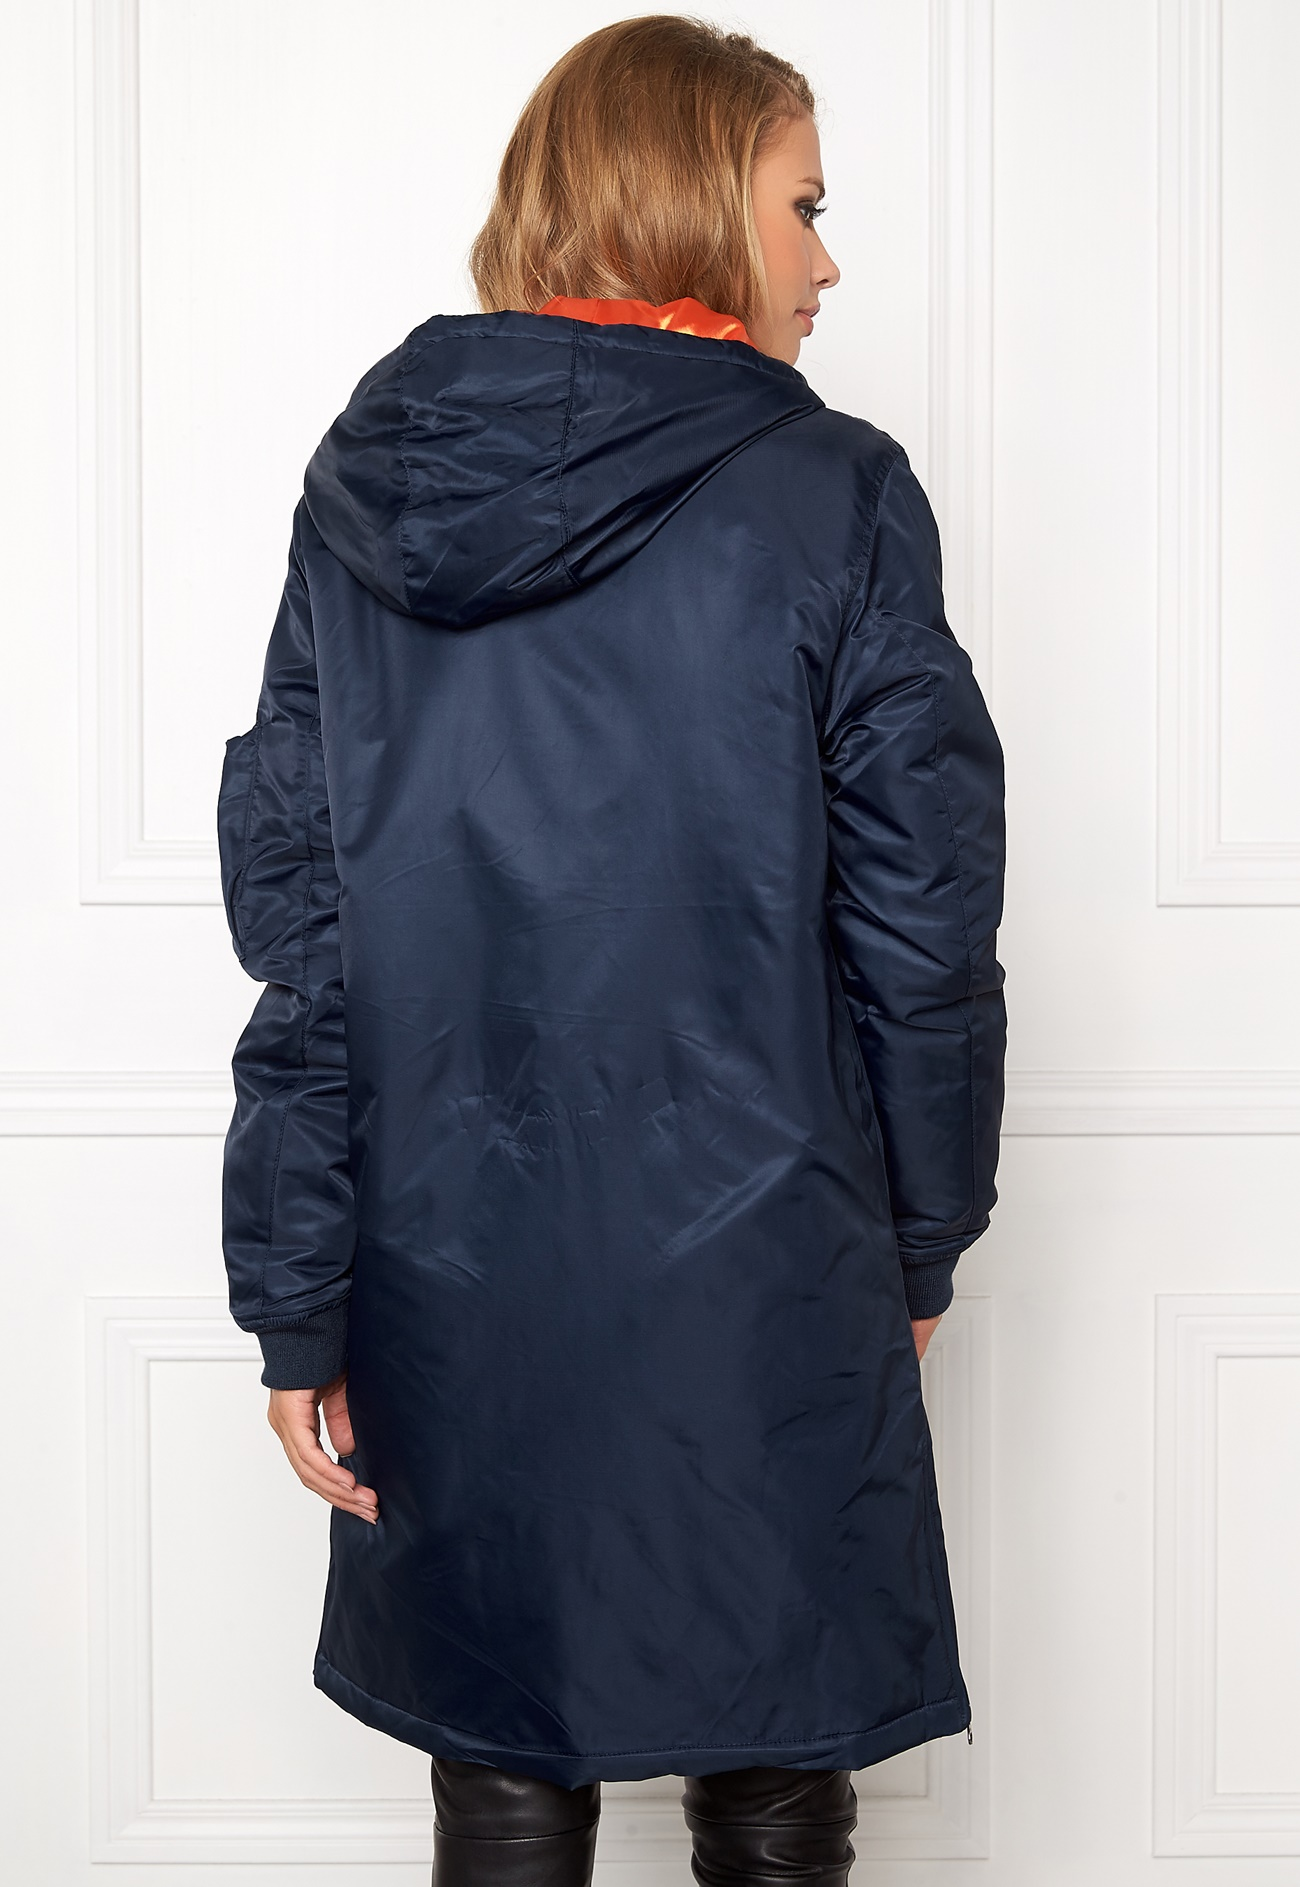 Mood Bomber Jackets: D.Brand Winter Edition Bomber Mood Indigo